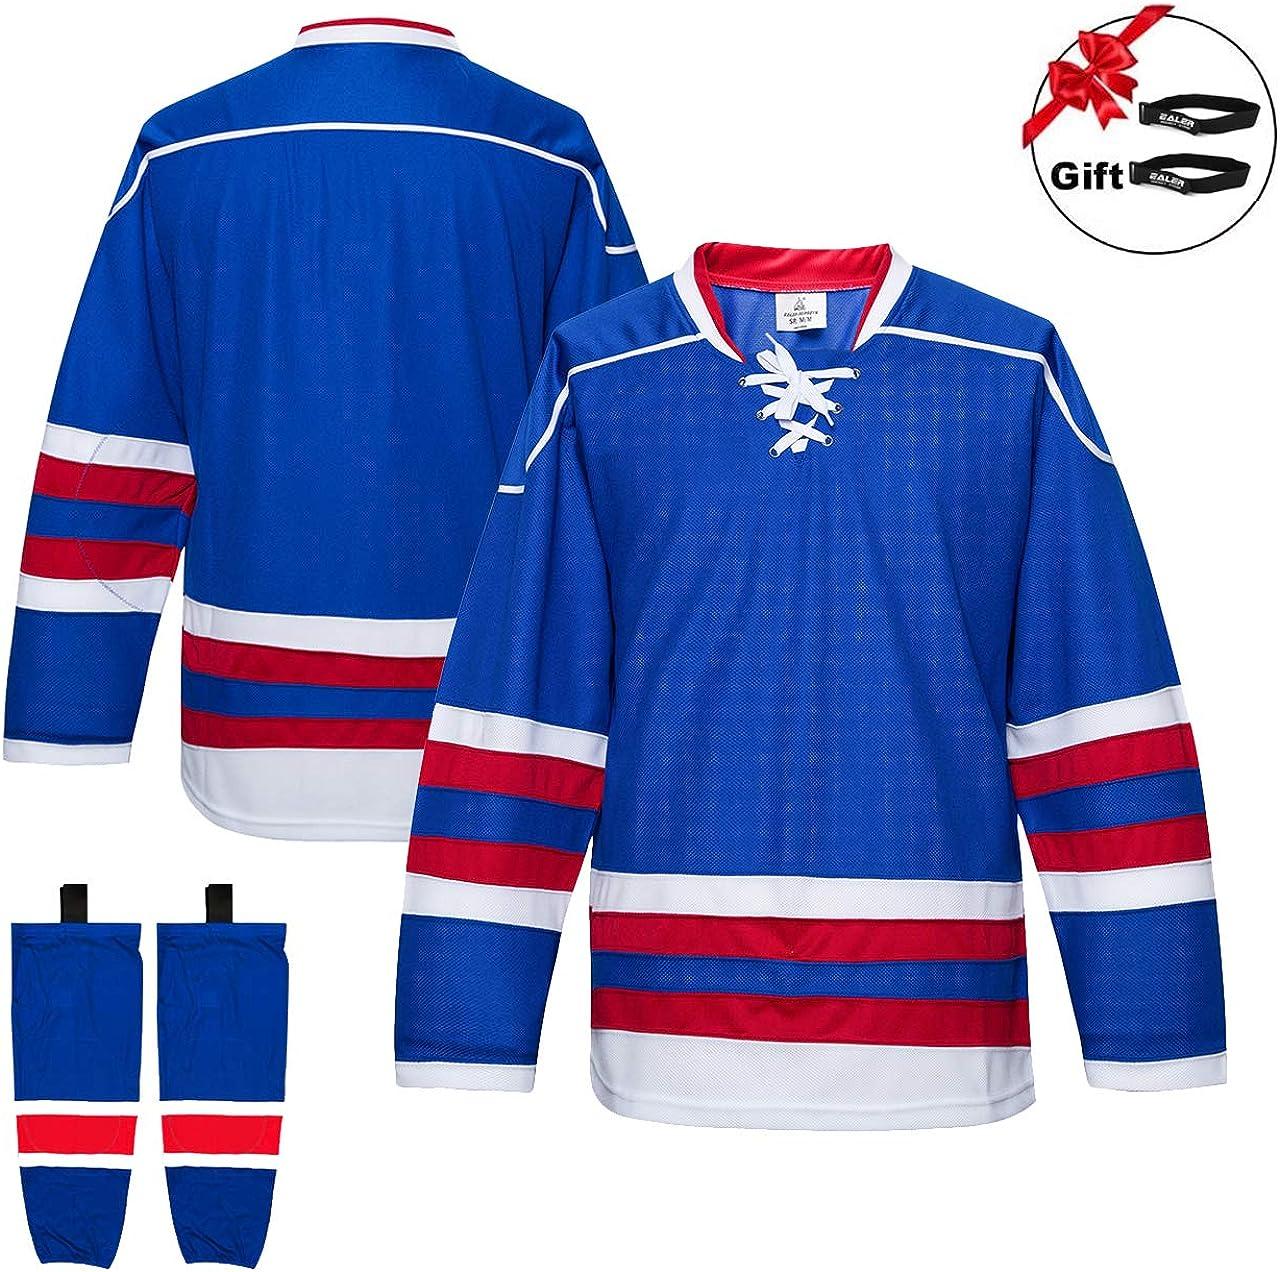 Senior to Junior EALER Mens /& Boys Team Ice Hockey Practice Jersey with Socks 2 Jerseys with 2 Pairs Socks